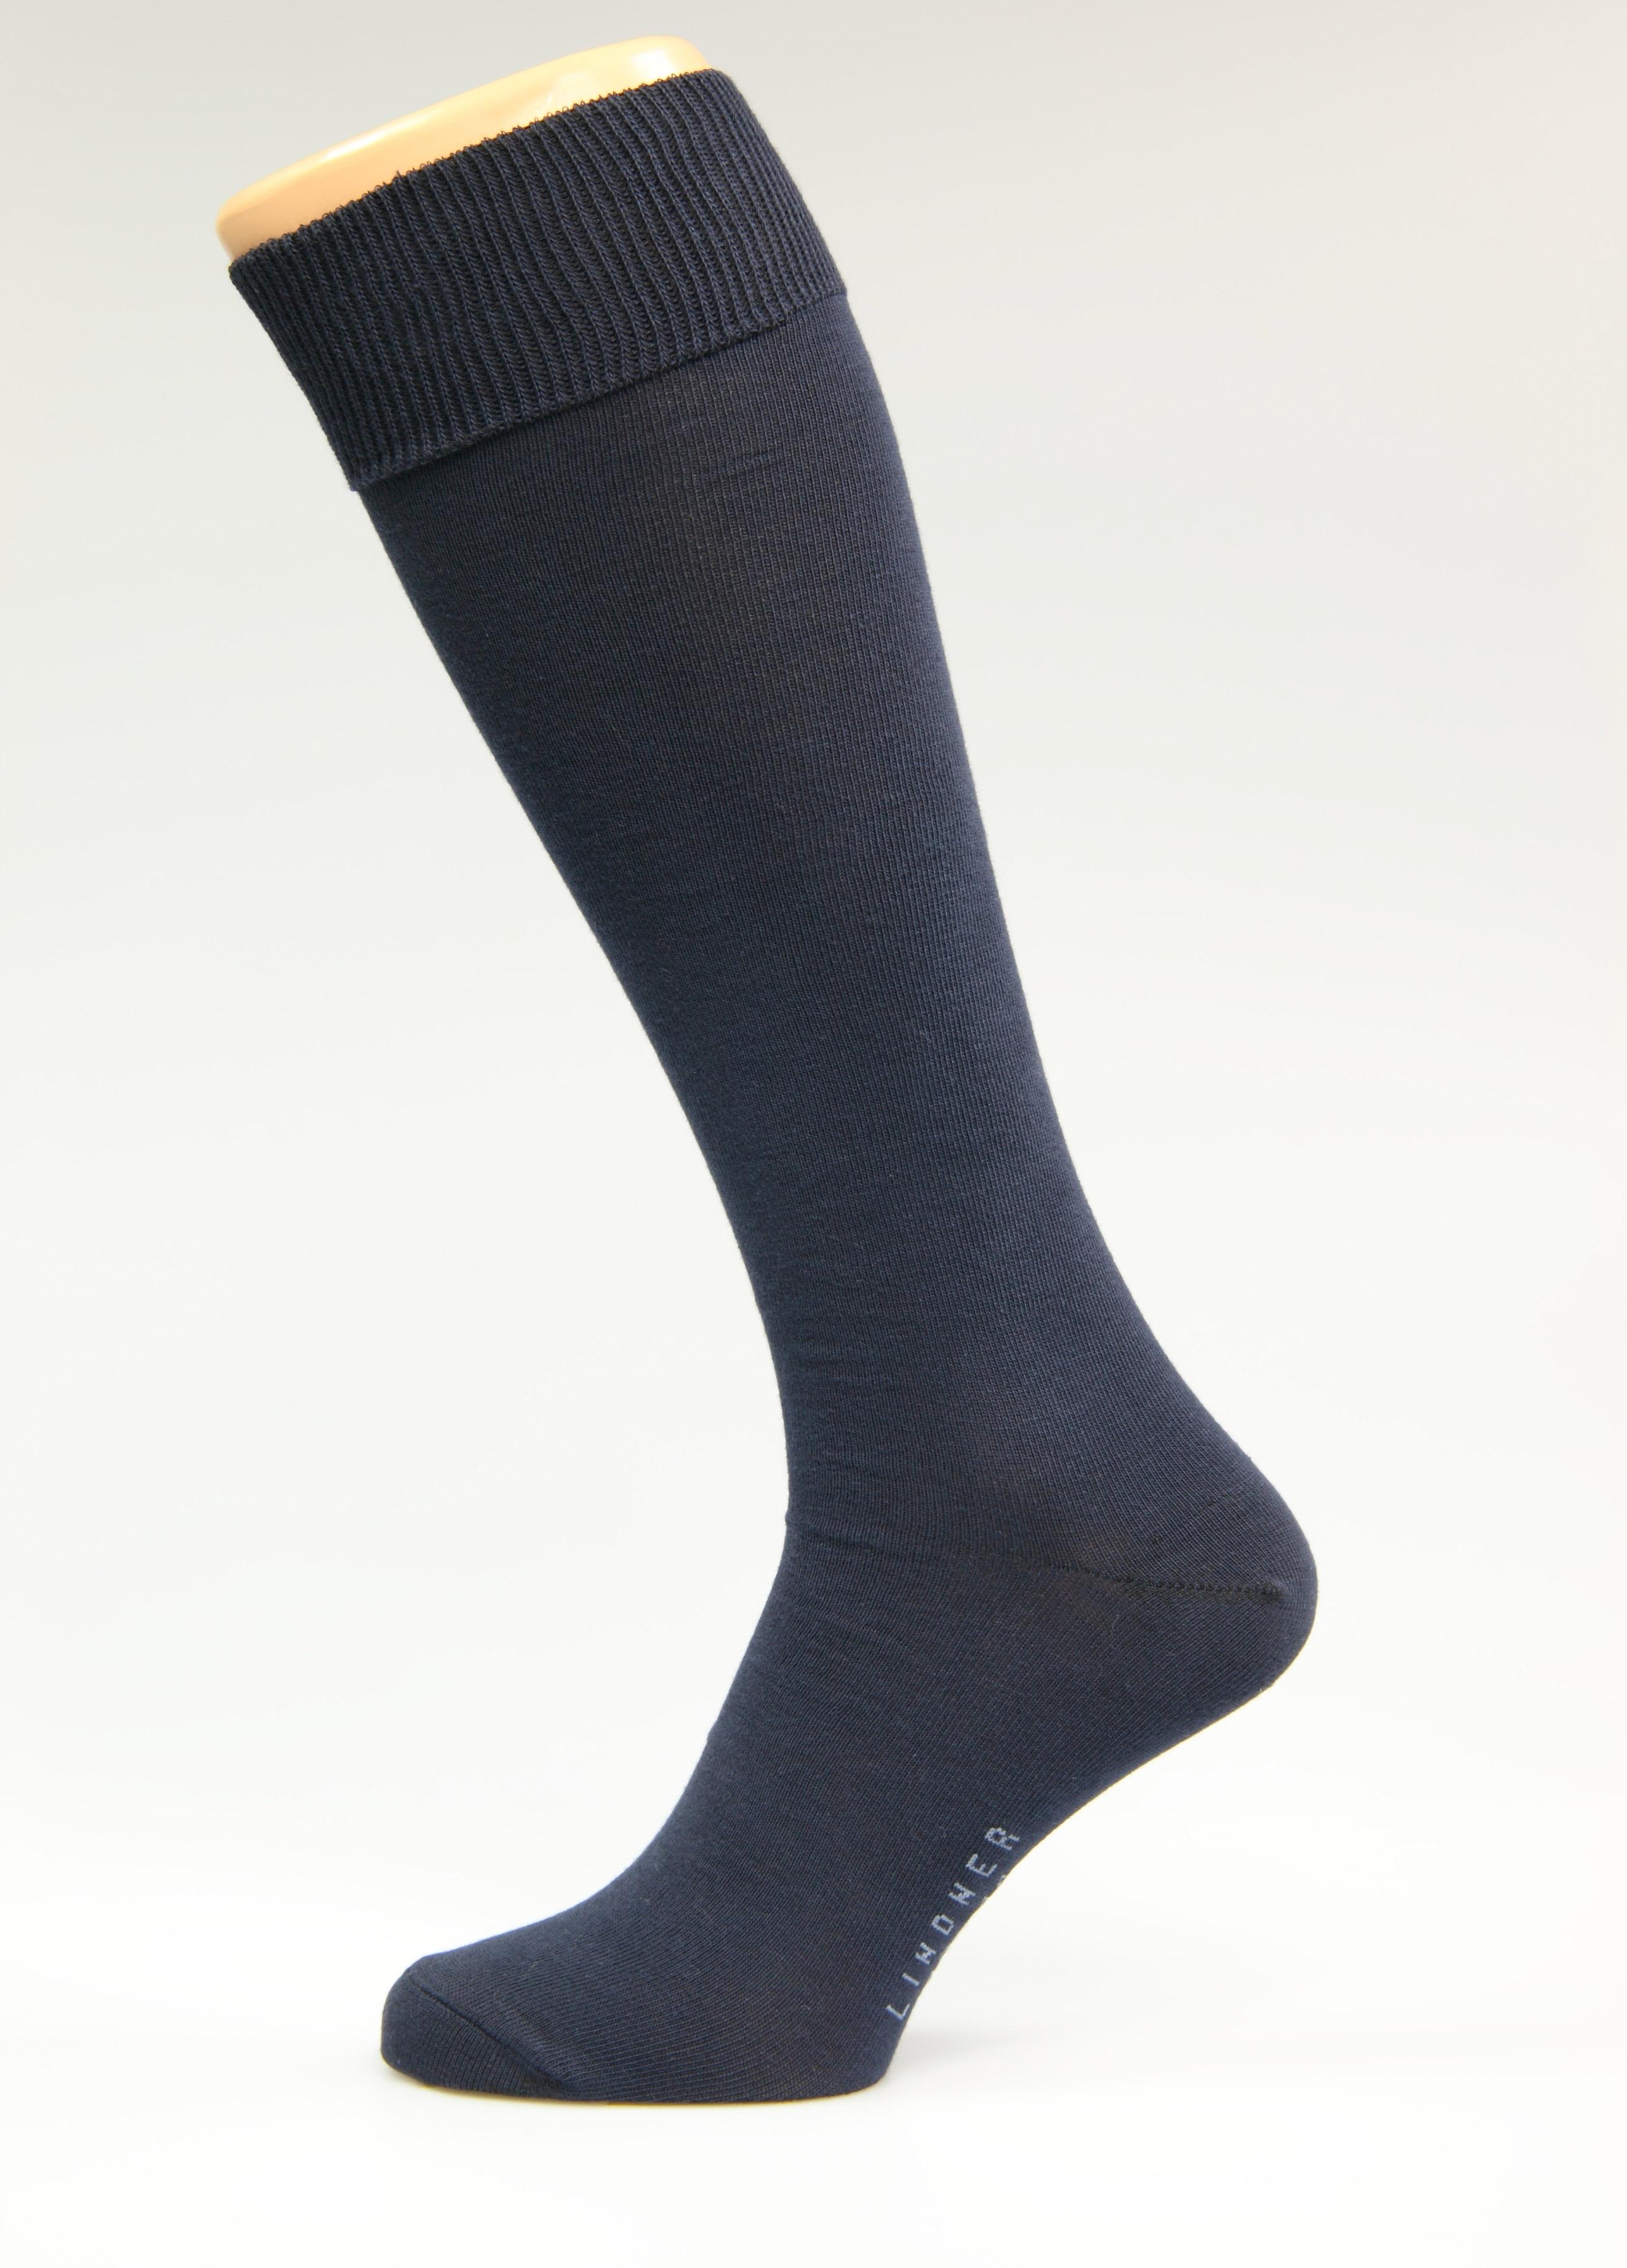 dunkelblaue-Kniestr-mpfe-Gr-sse-42-44